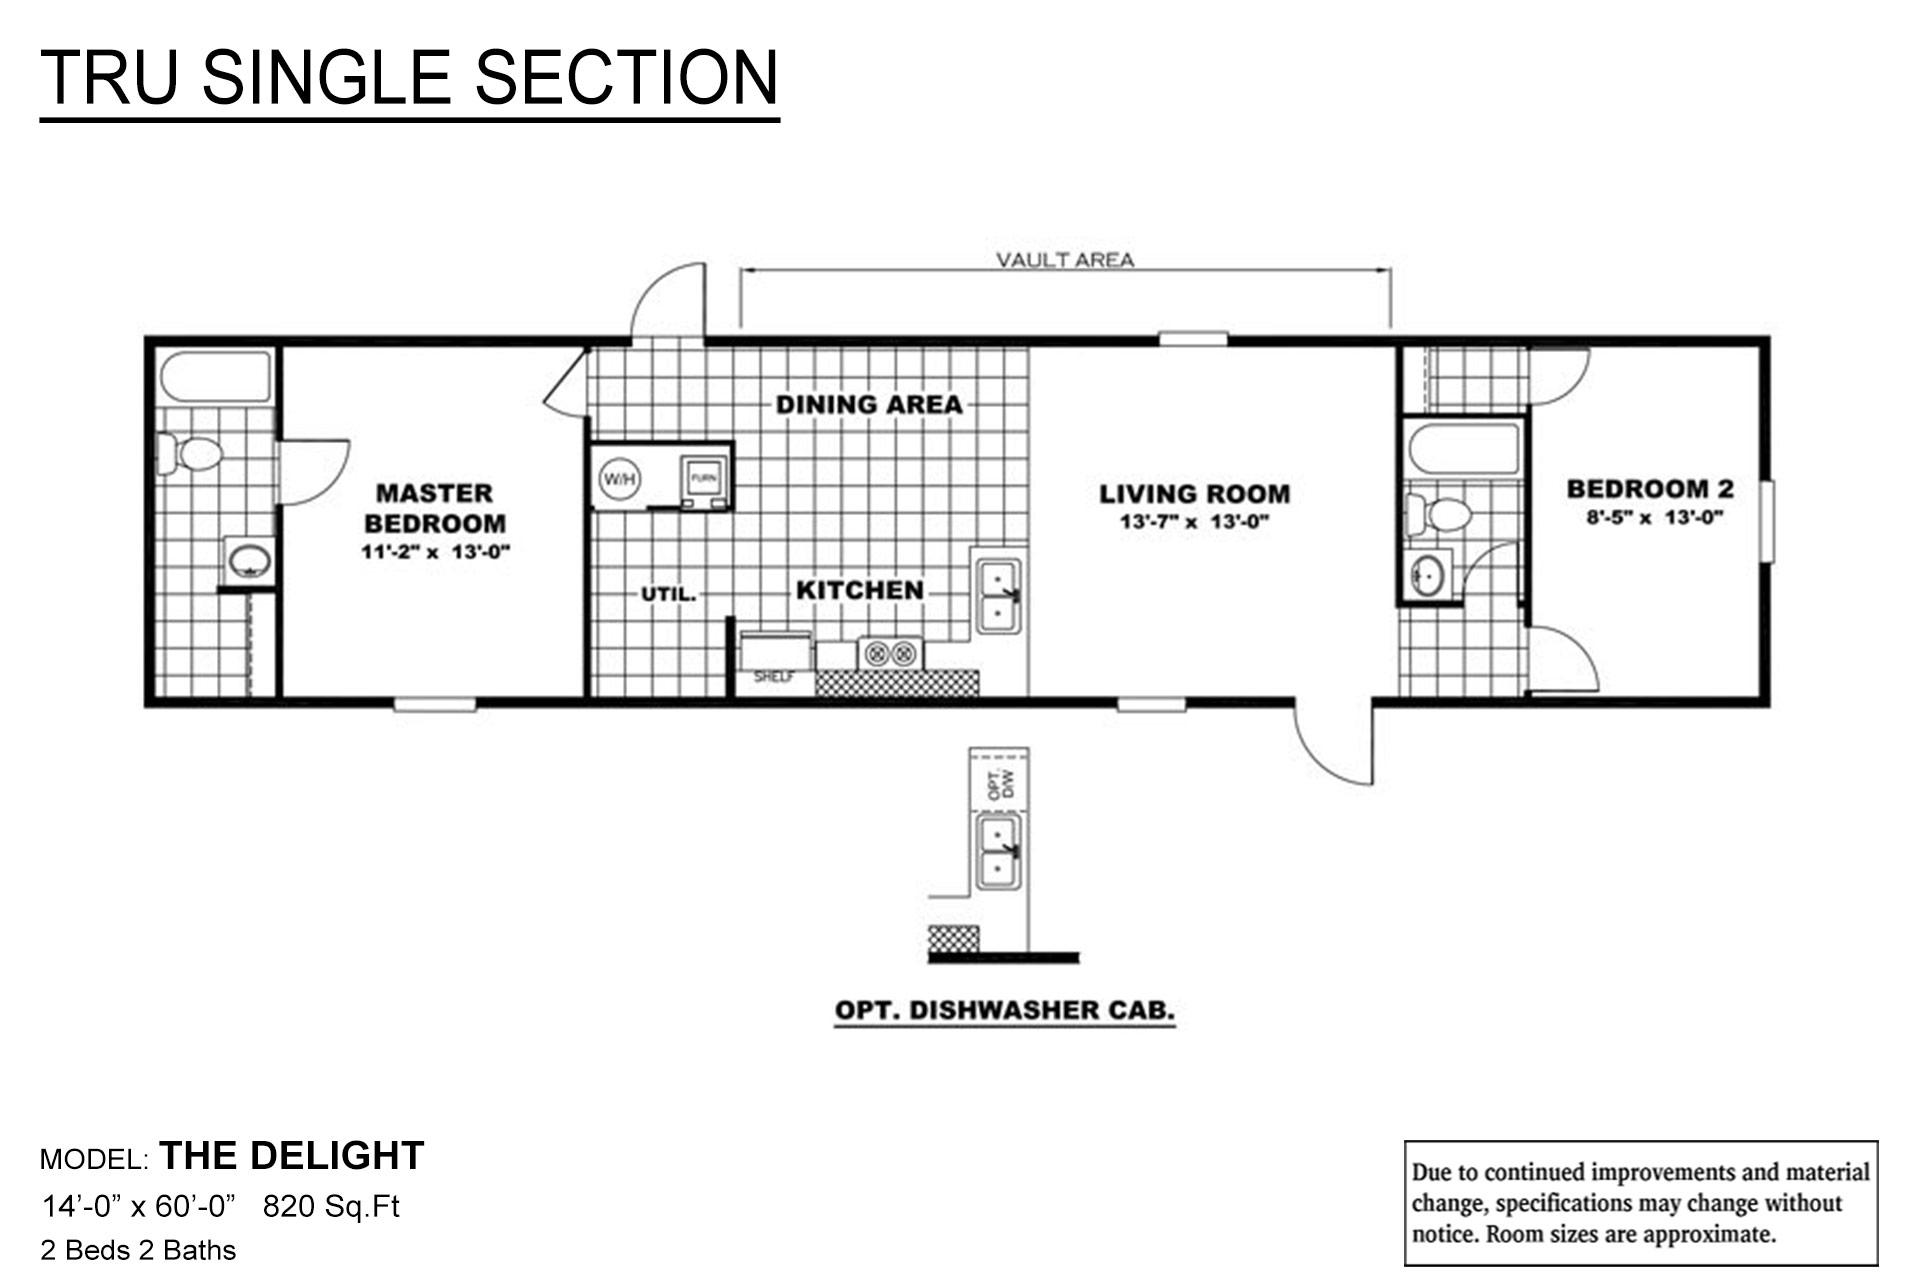 TRU Single Section - Delight